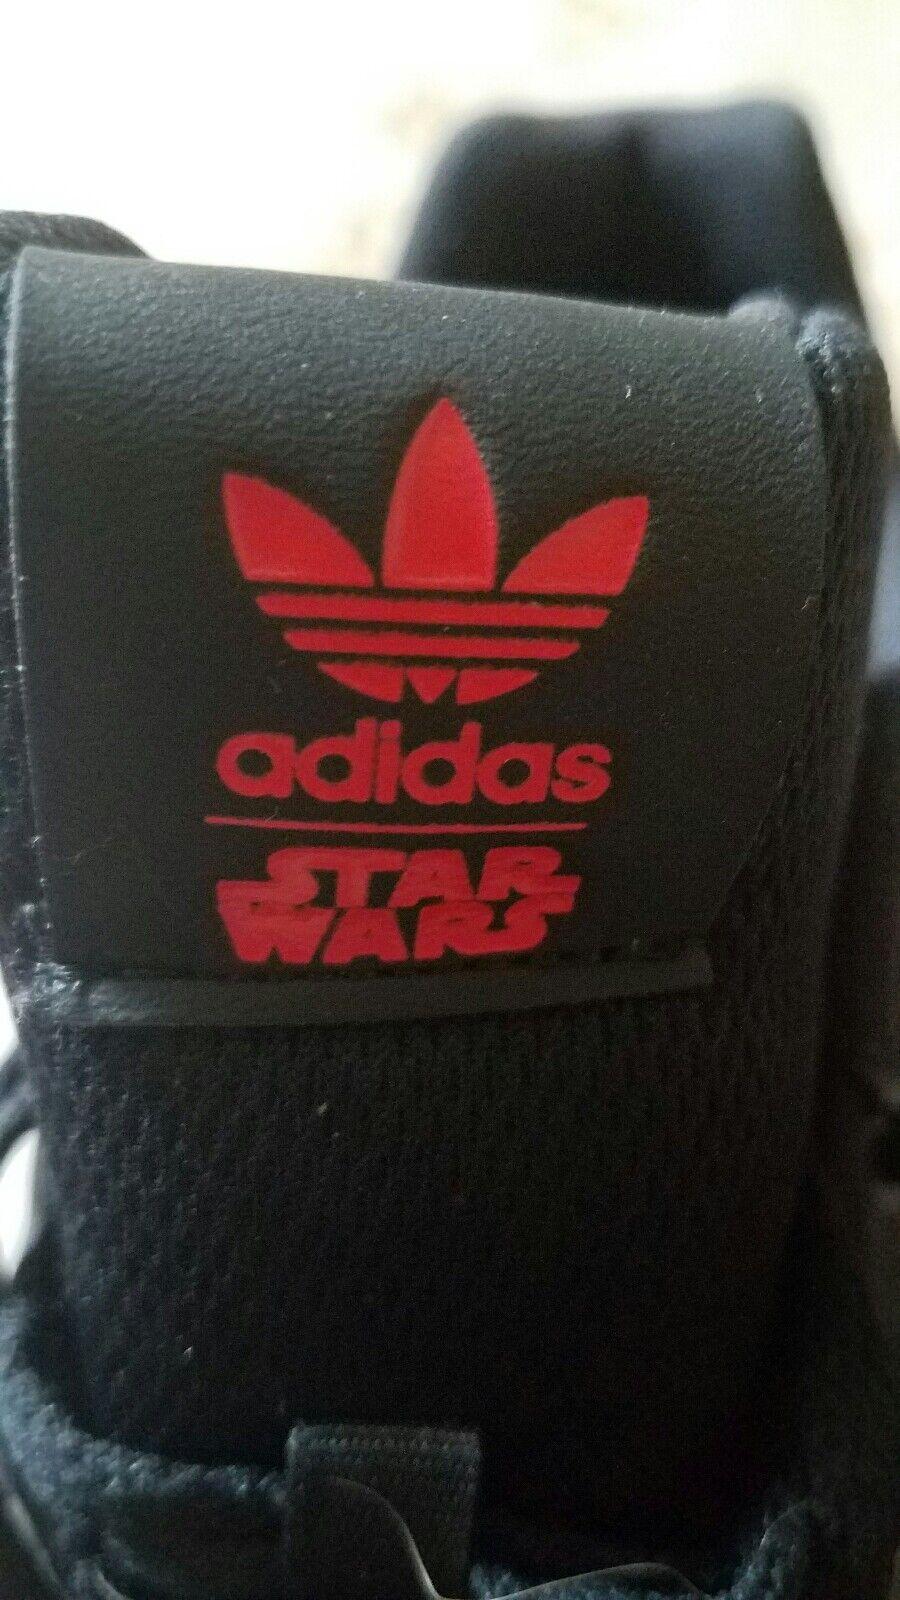 Adidas zx star flusso torsione